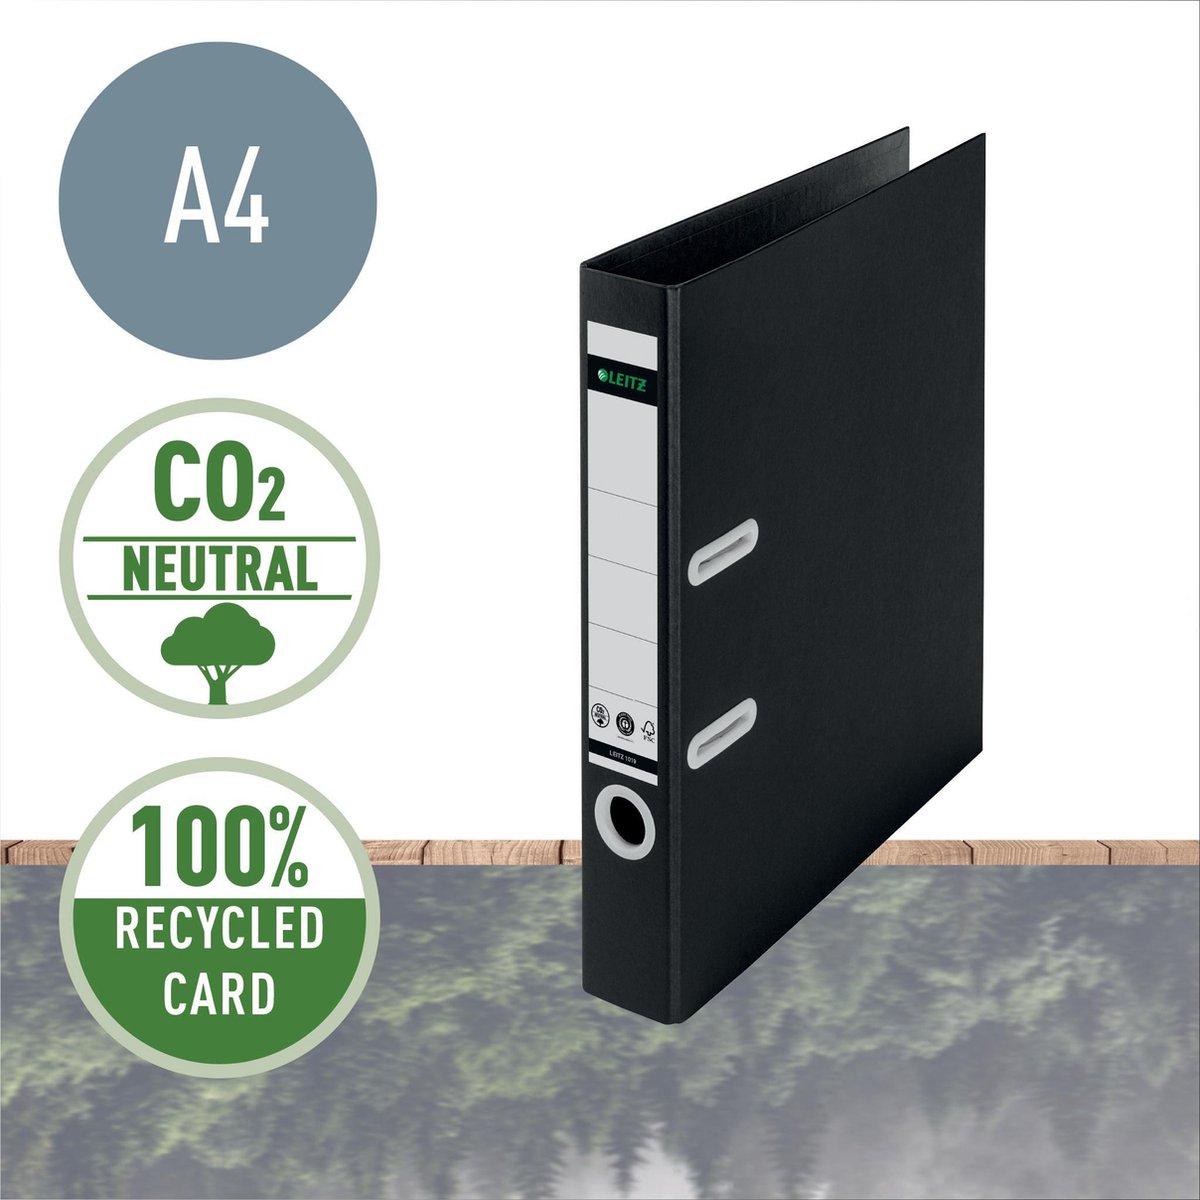 Leitz 180° Recycle Ordner A4 - 50mm - 100% Recyclebaar Met FSC & Blue Angel Milieucertificering - Transparant - Zwart/Lichtgrijs